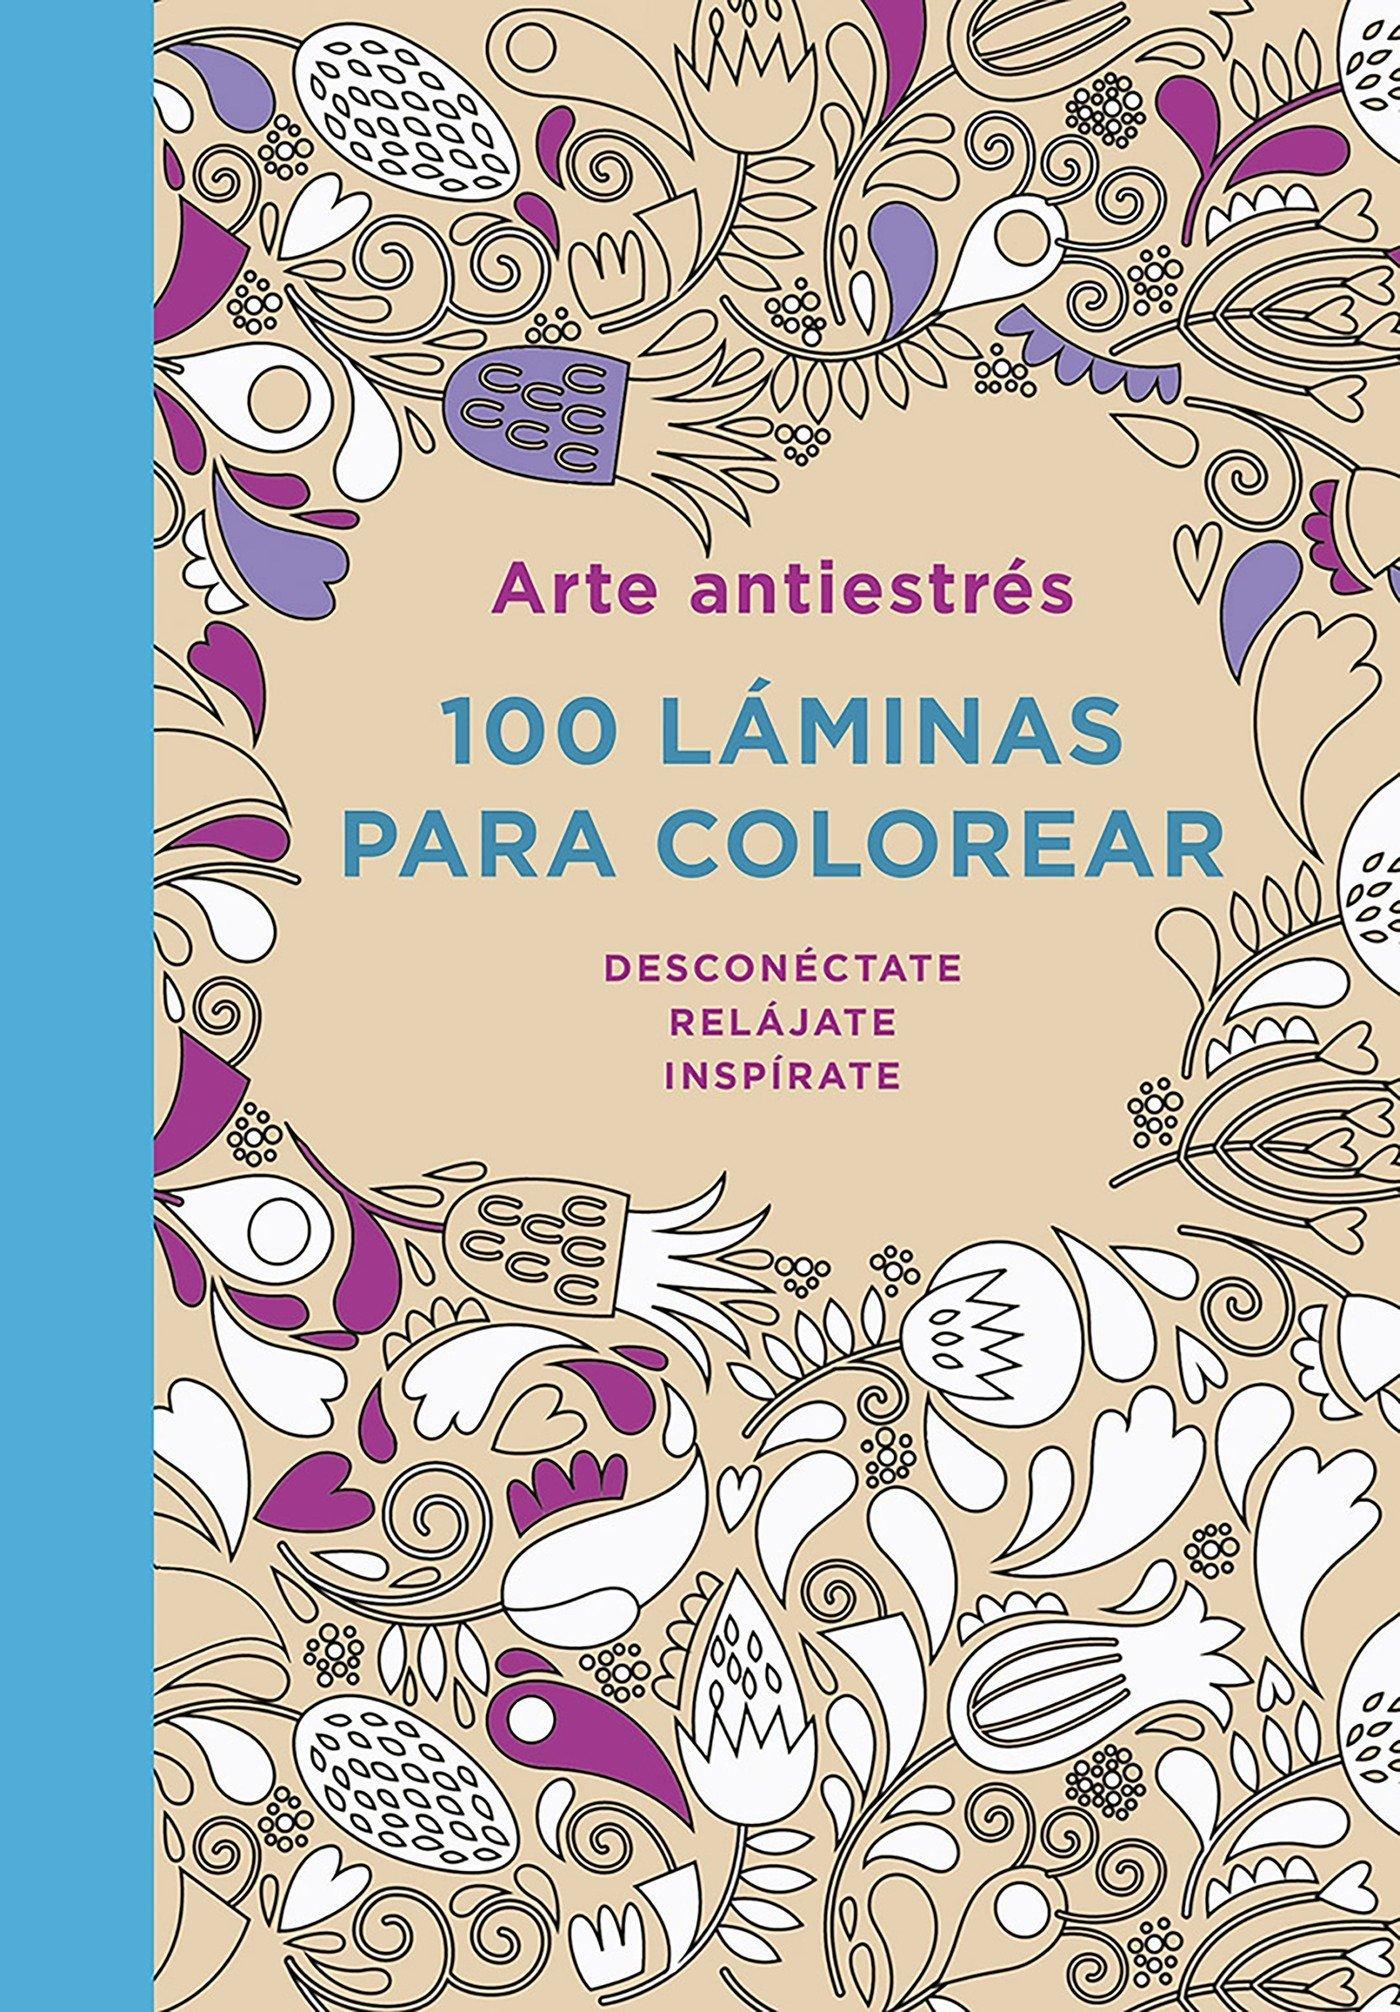 Arte antiestrés: 100 láminas para colorear: Desconecta. Relájate. Inspírate:  Michael O'Mara Books: Amazon.com.mx: Libros